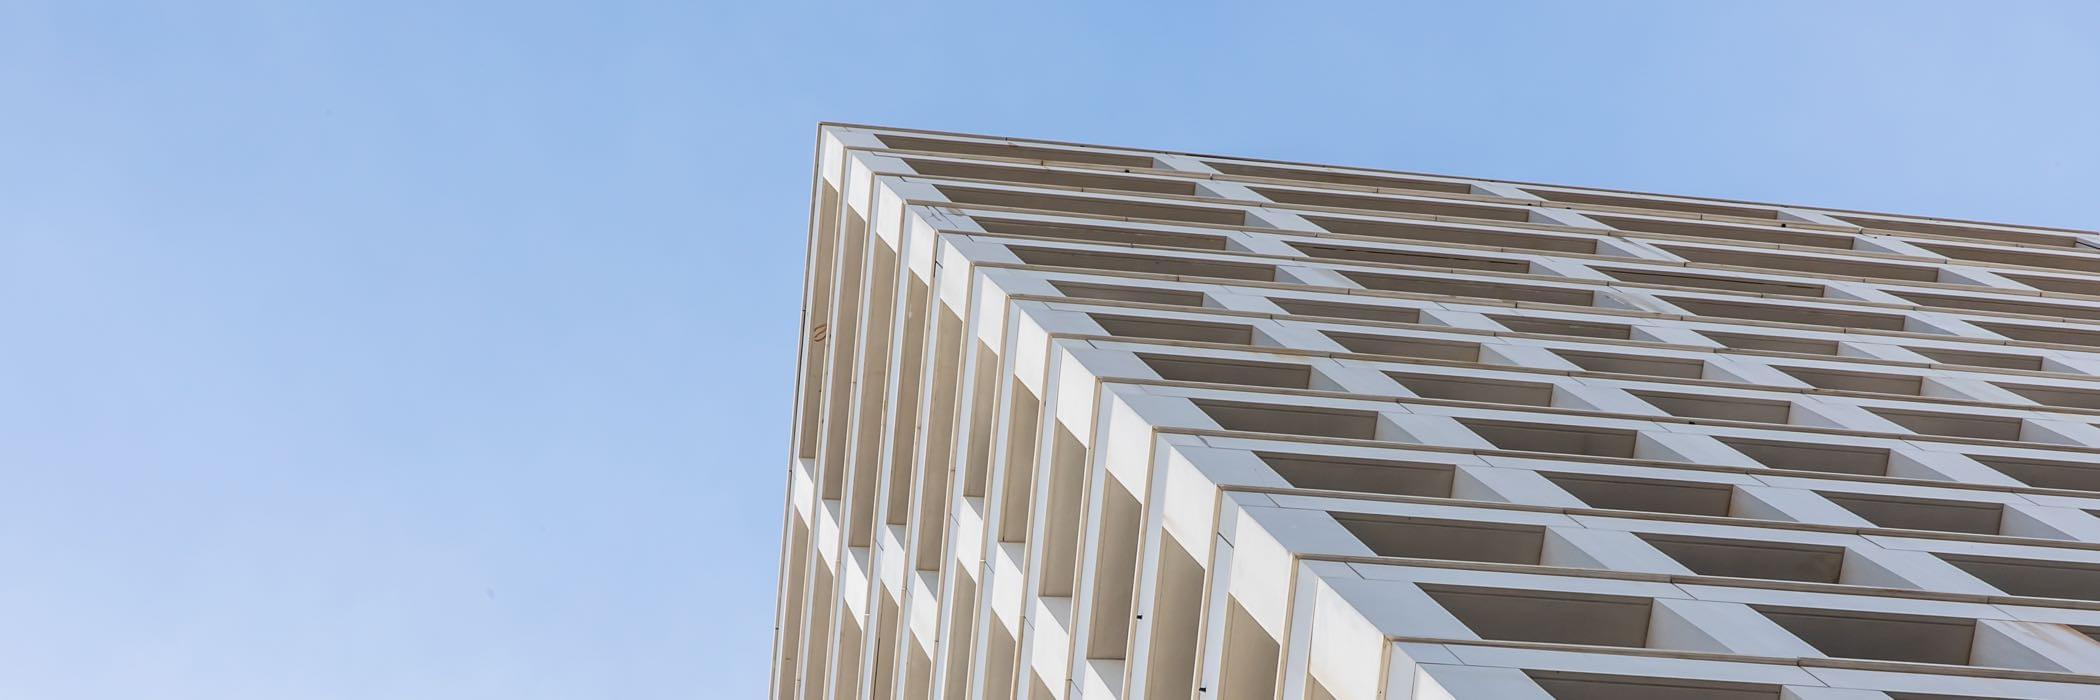 verheyen-beton-turnova-toren